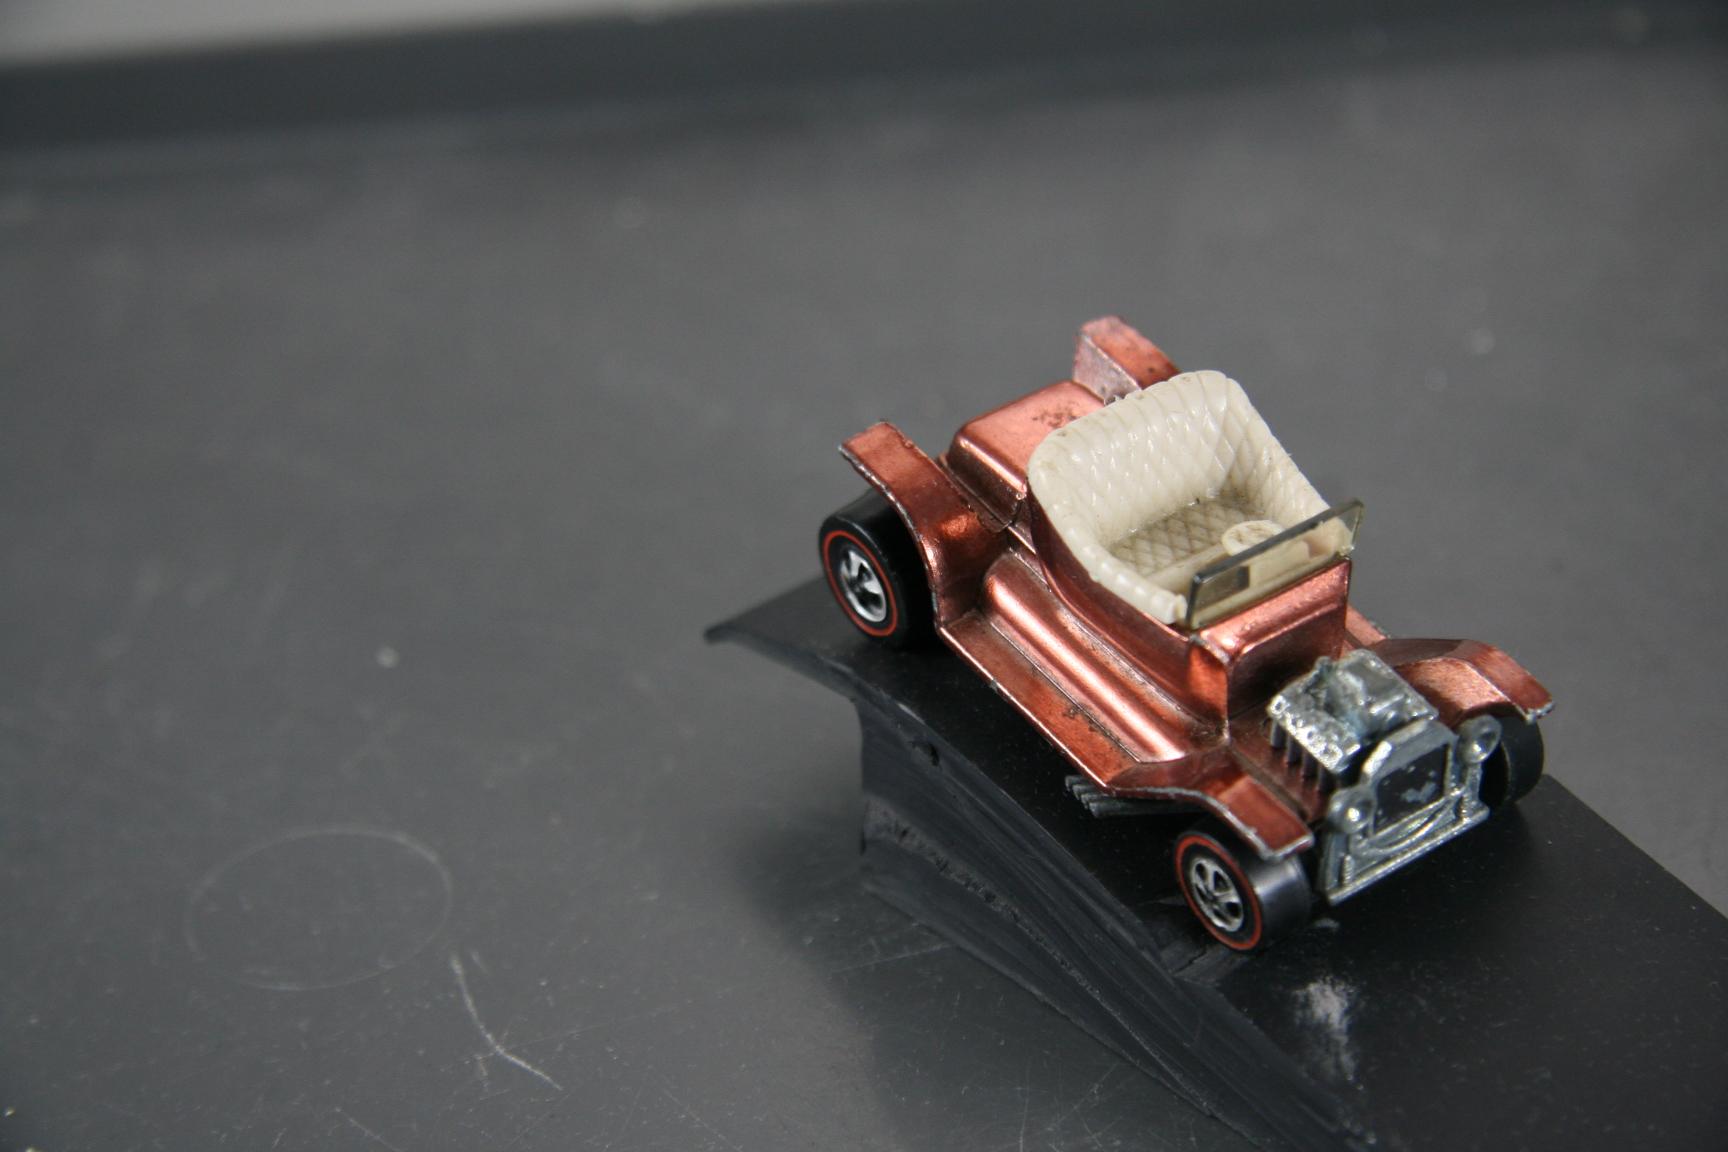 Hot Wheels wanted, vintage Hot Wheels, Old